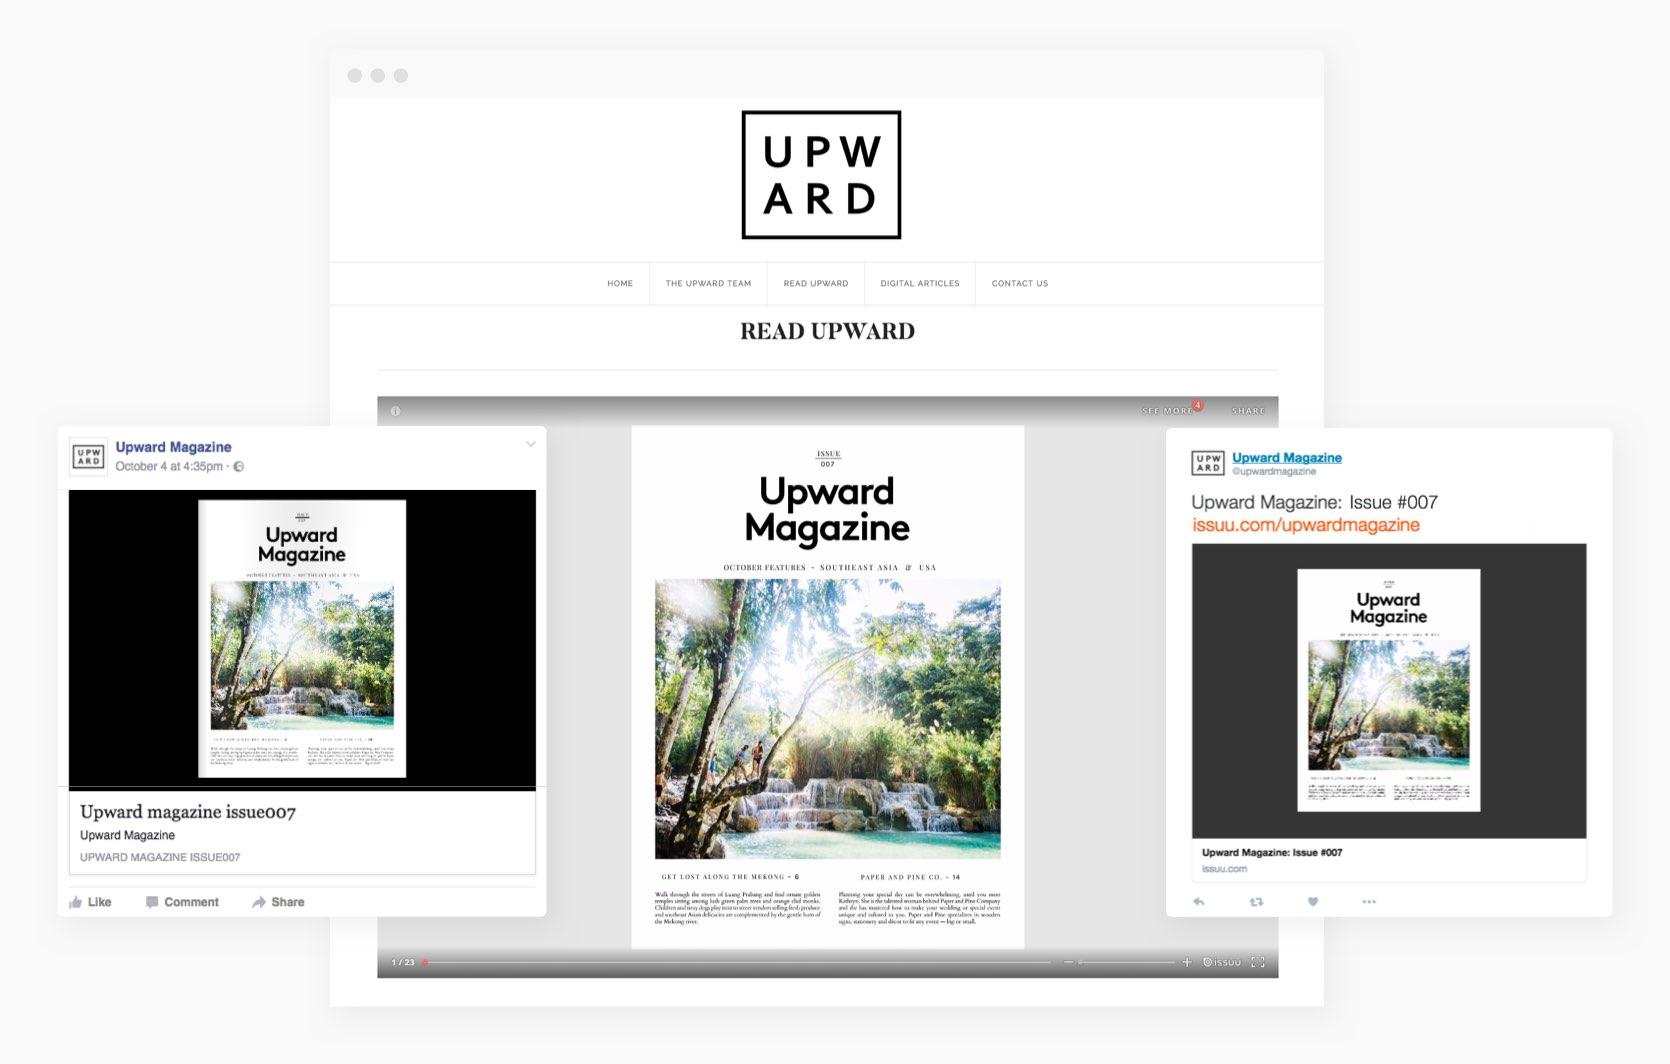 Digital Publishing Platform for Magazines, Catalogs, and